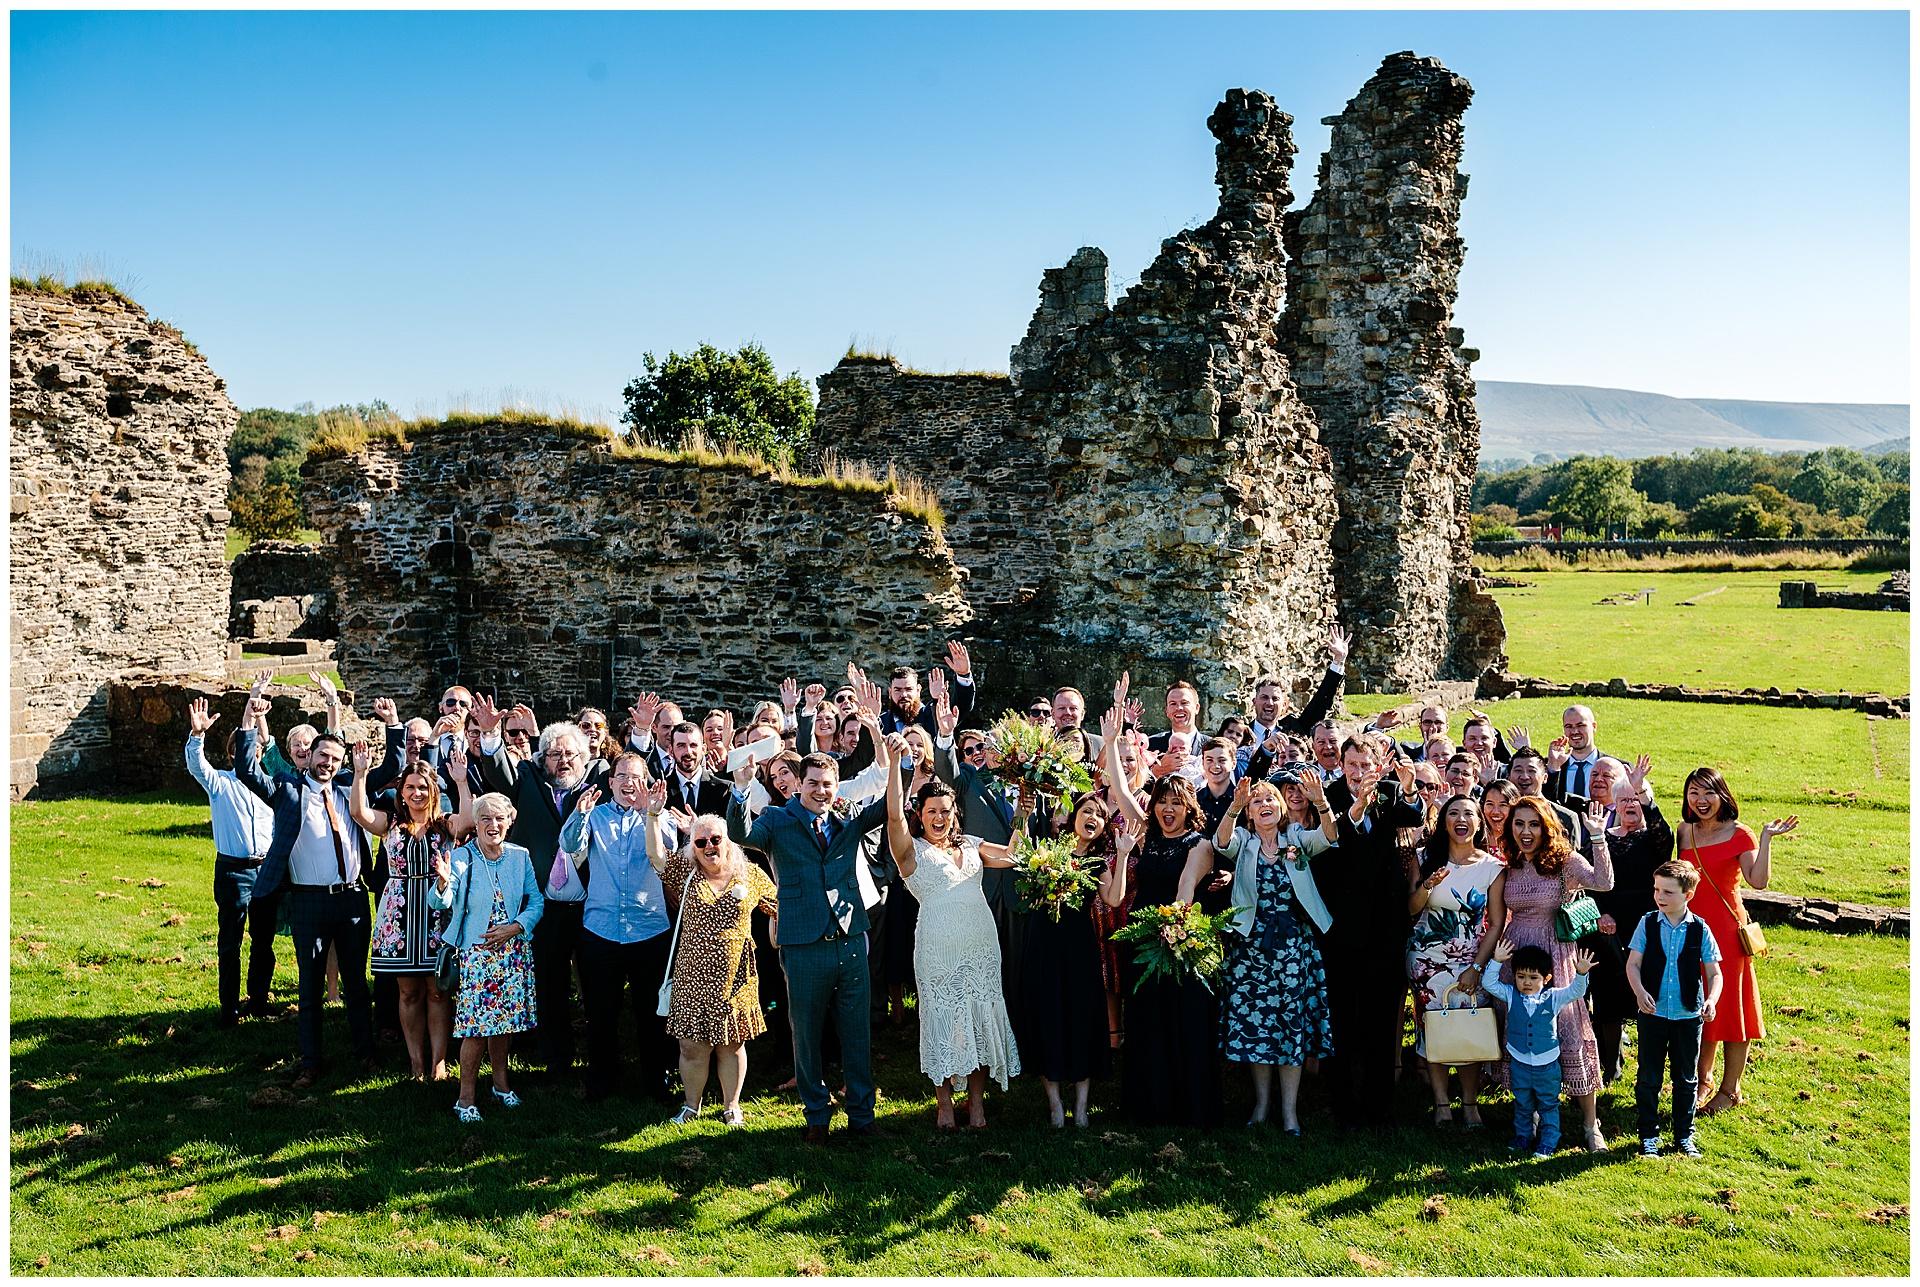 Lancashire wedding photographer goup photos at wedding venue